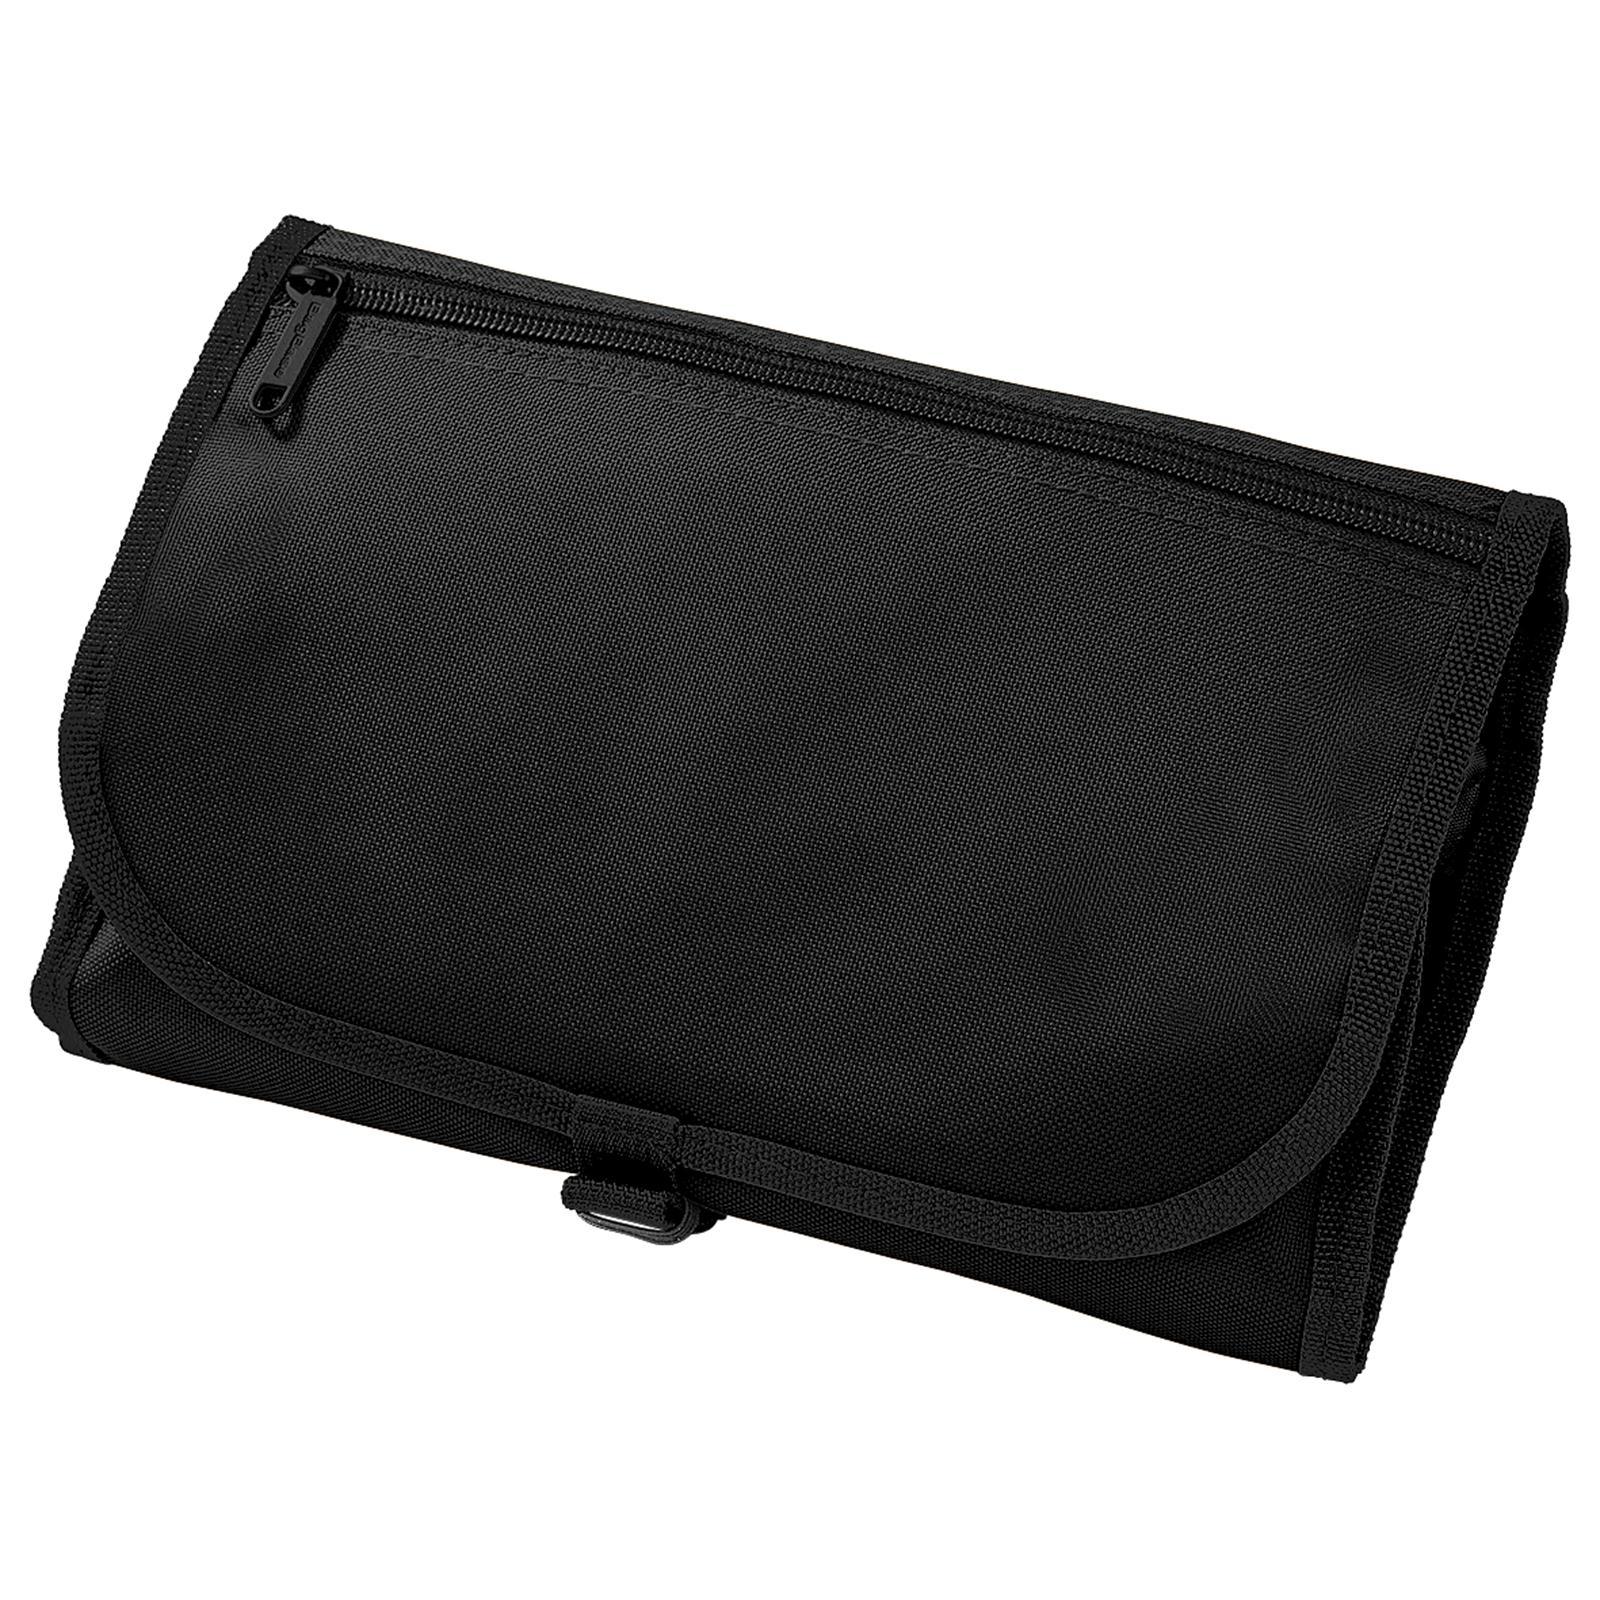 New Bagbase Mens Travel Mirror Wash Toiletry Bag In Black